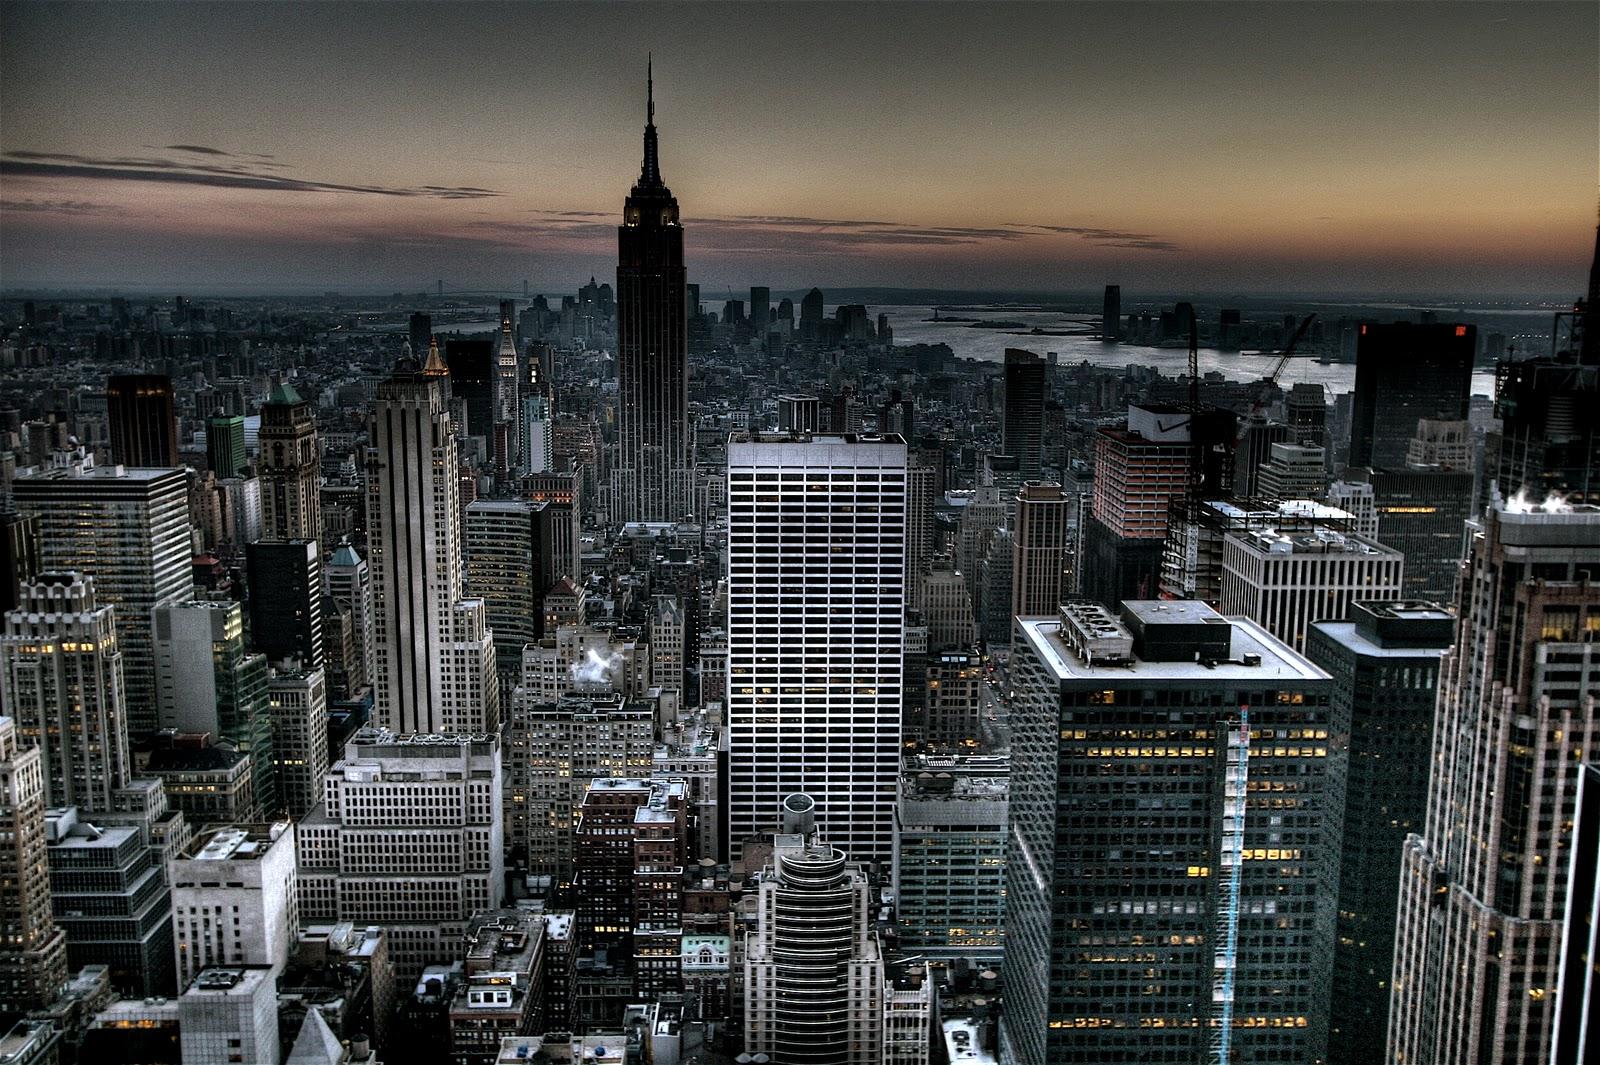 http://4.bp.blogspot.com/-m8mevN07rGM/Txl7GDIoLKI/AAAAAAAAEL8/DAkXbDH6-zI/s1600/new-york-city-2.jpg